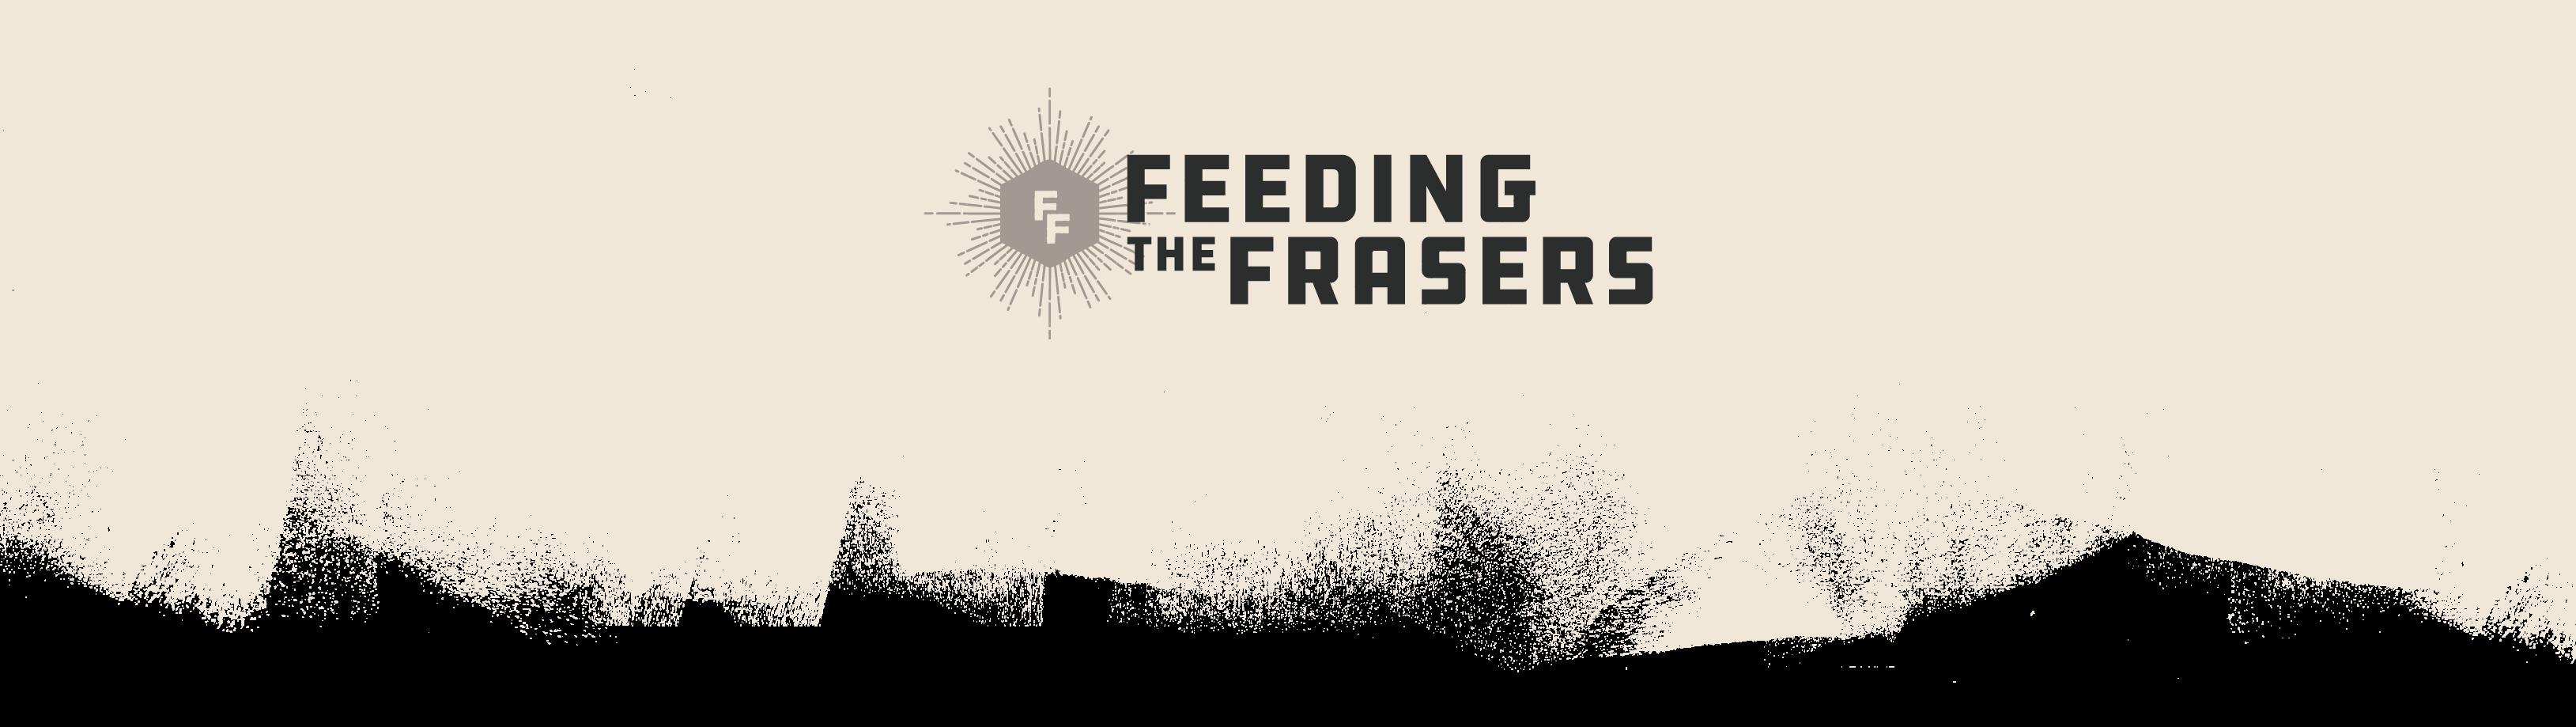 Feeding The Frasers